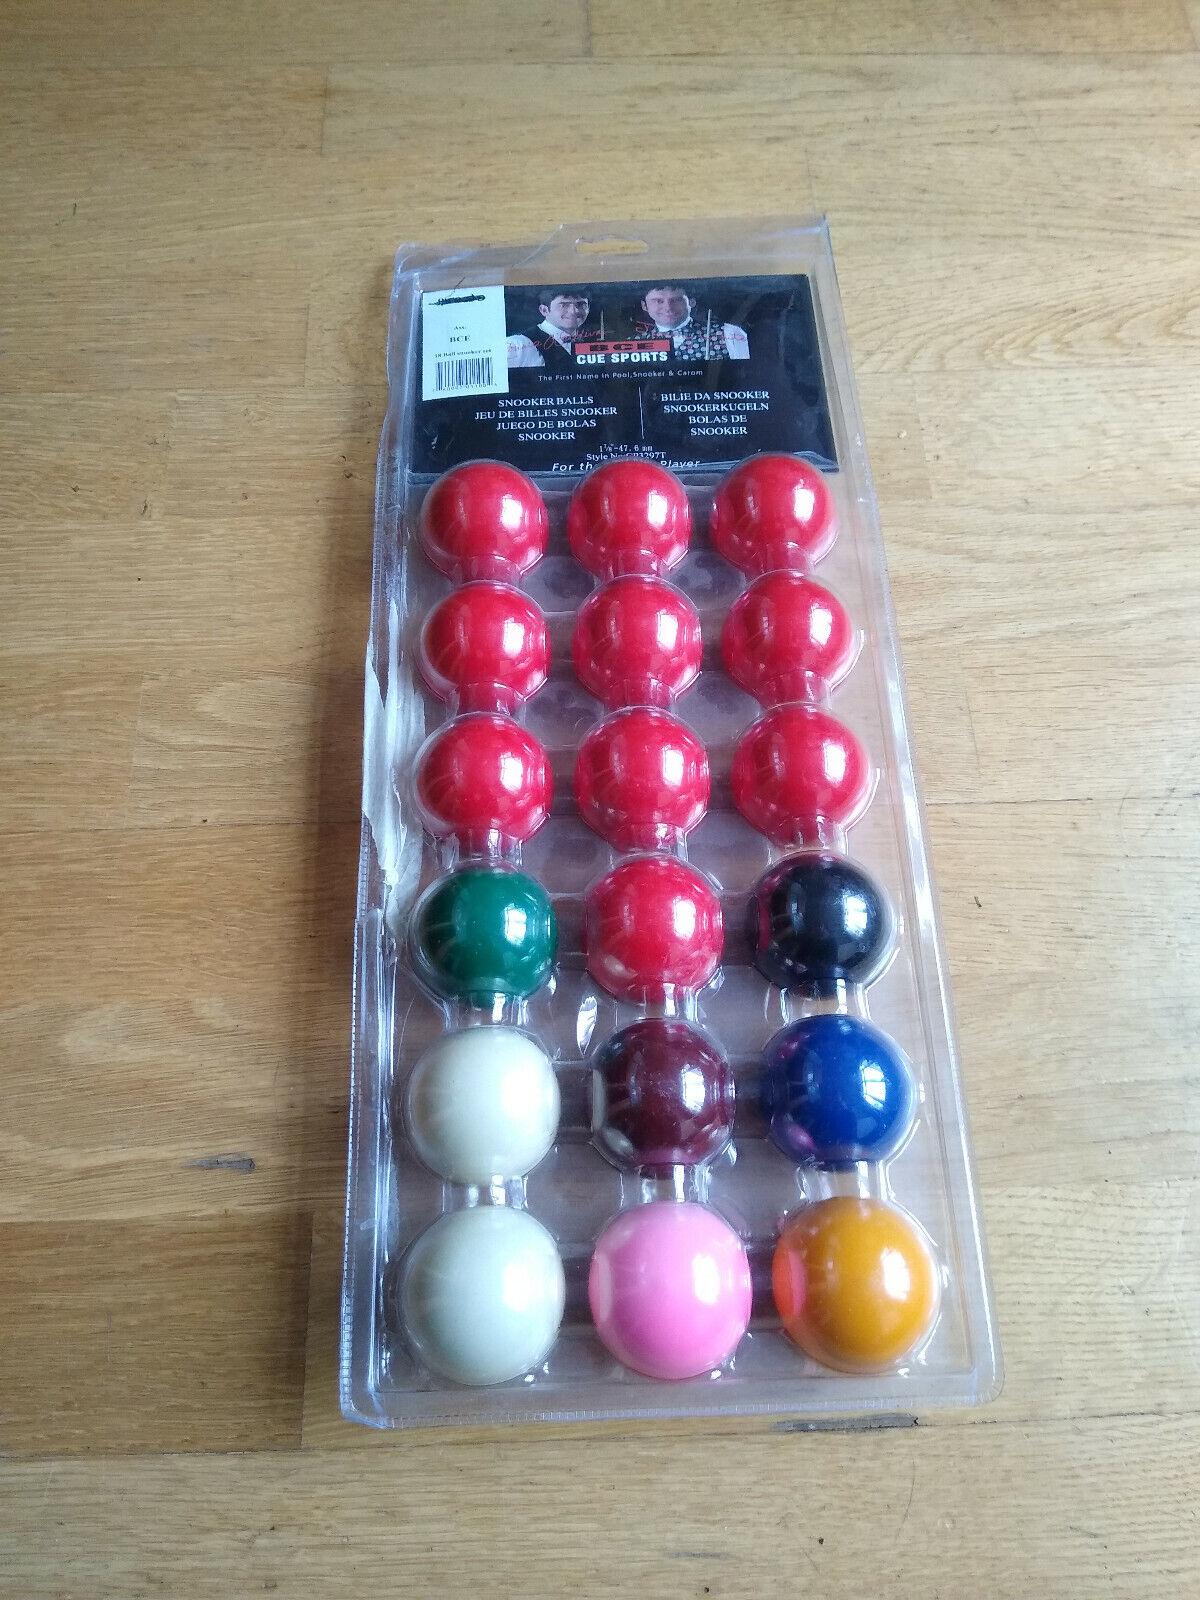 snooker balls 1 7/8 Hardley ever used